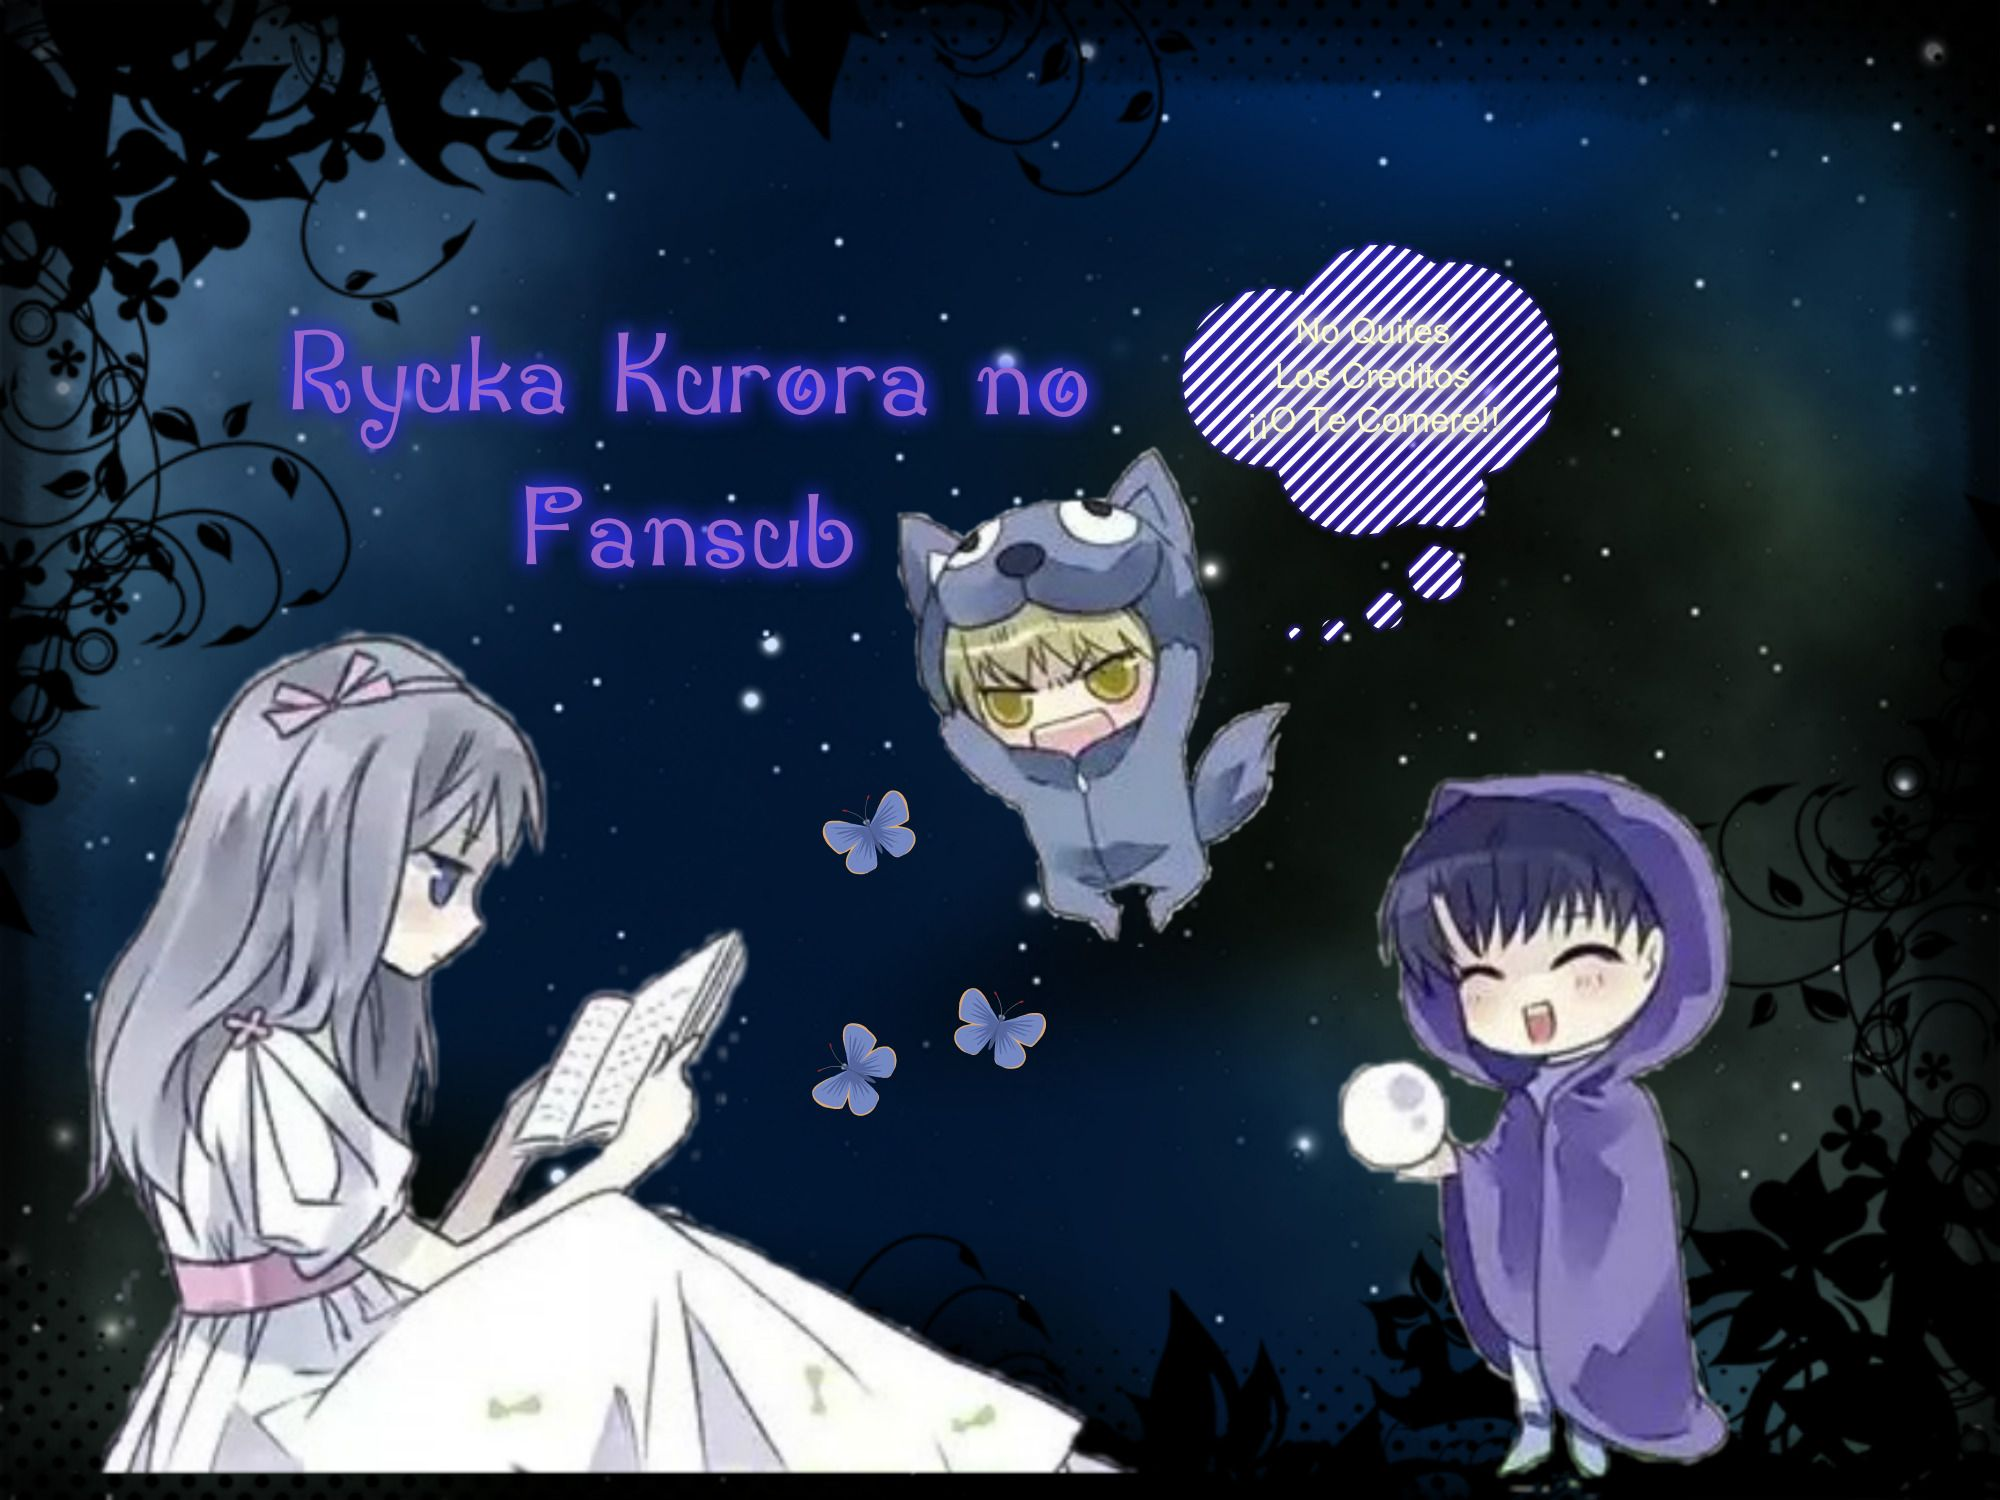 http://c5.ninemanga.com/es_manga/4/836/454382/0328e3e3377eeeb62aa0337bb33f425e.jpg Page 1